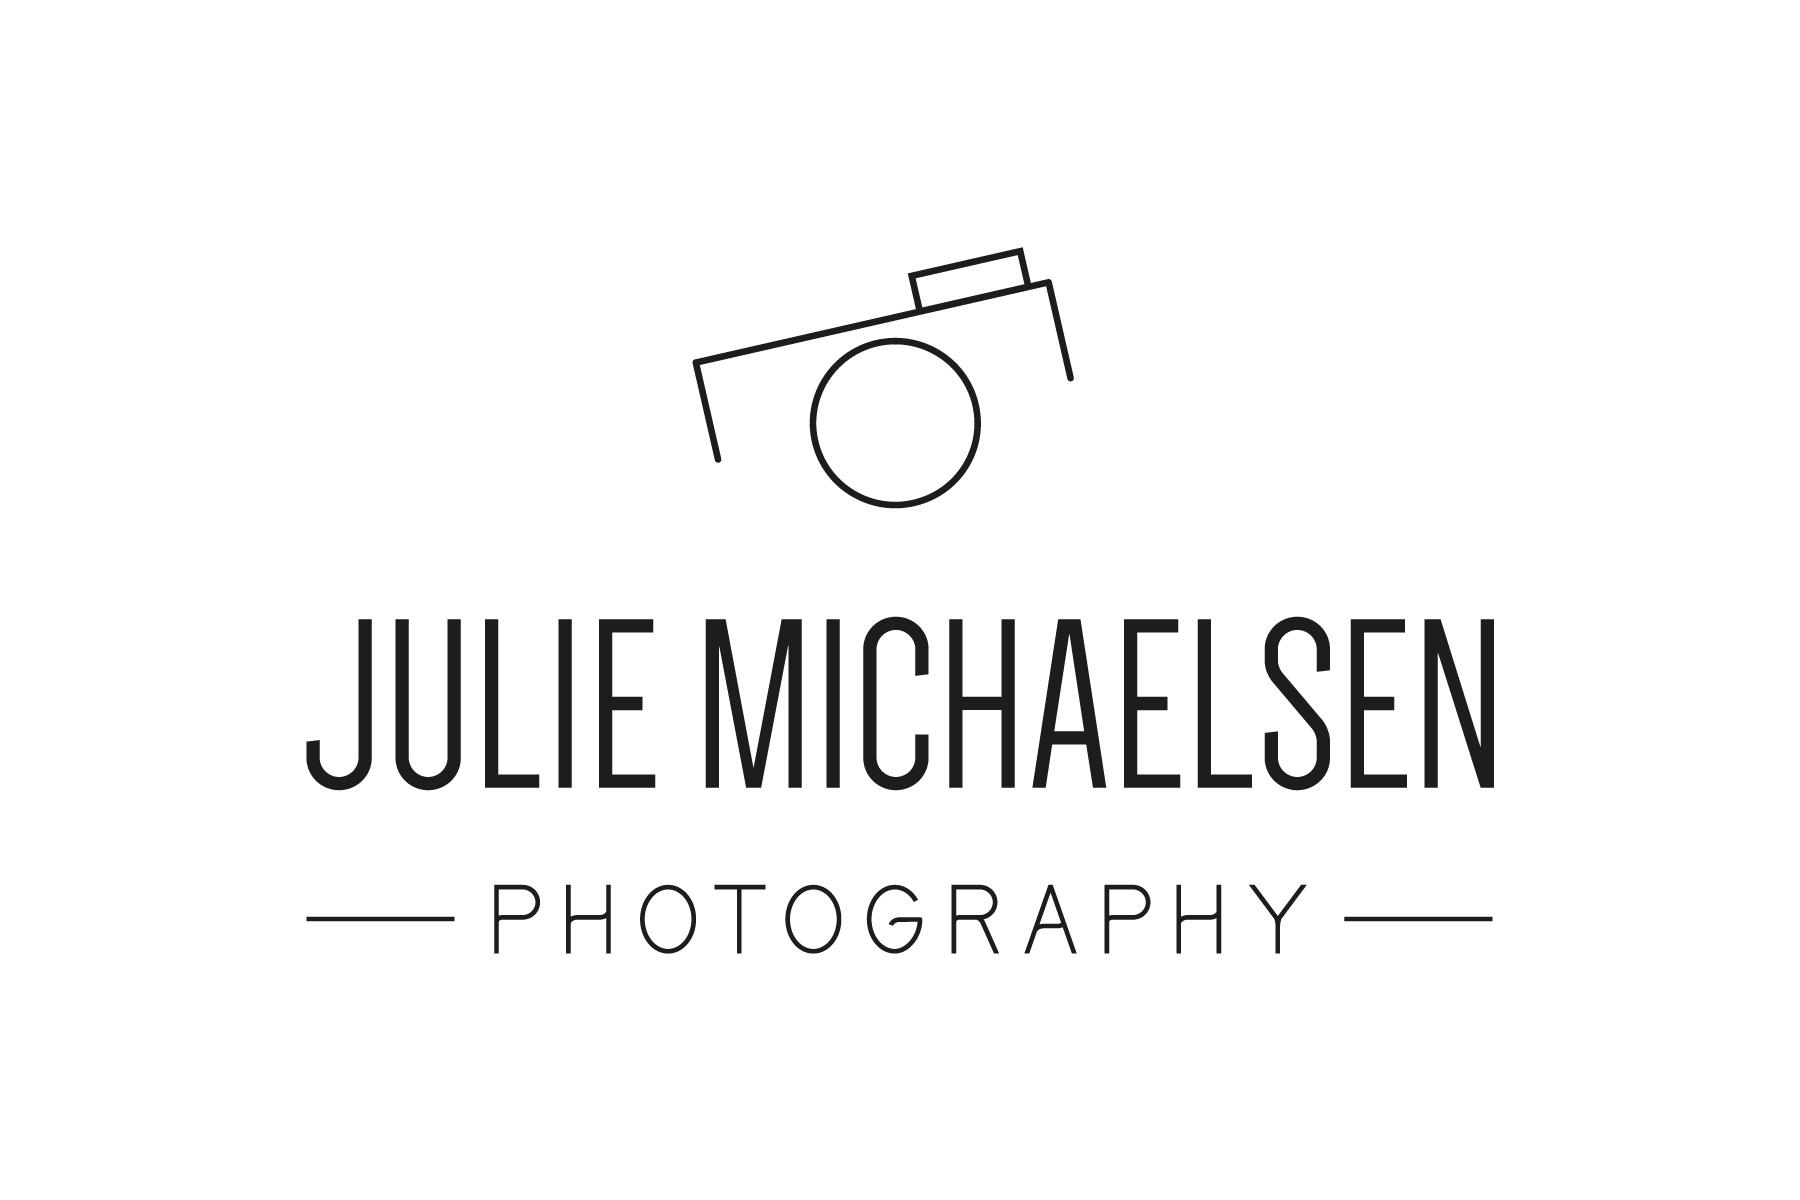 julie-michaelsen-photography-2.jpg